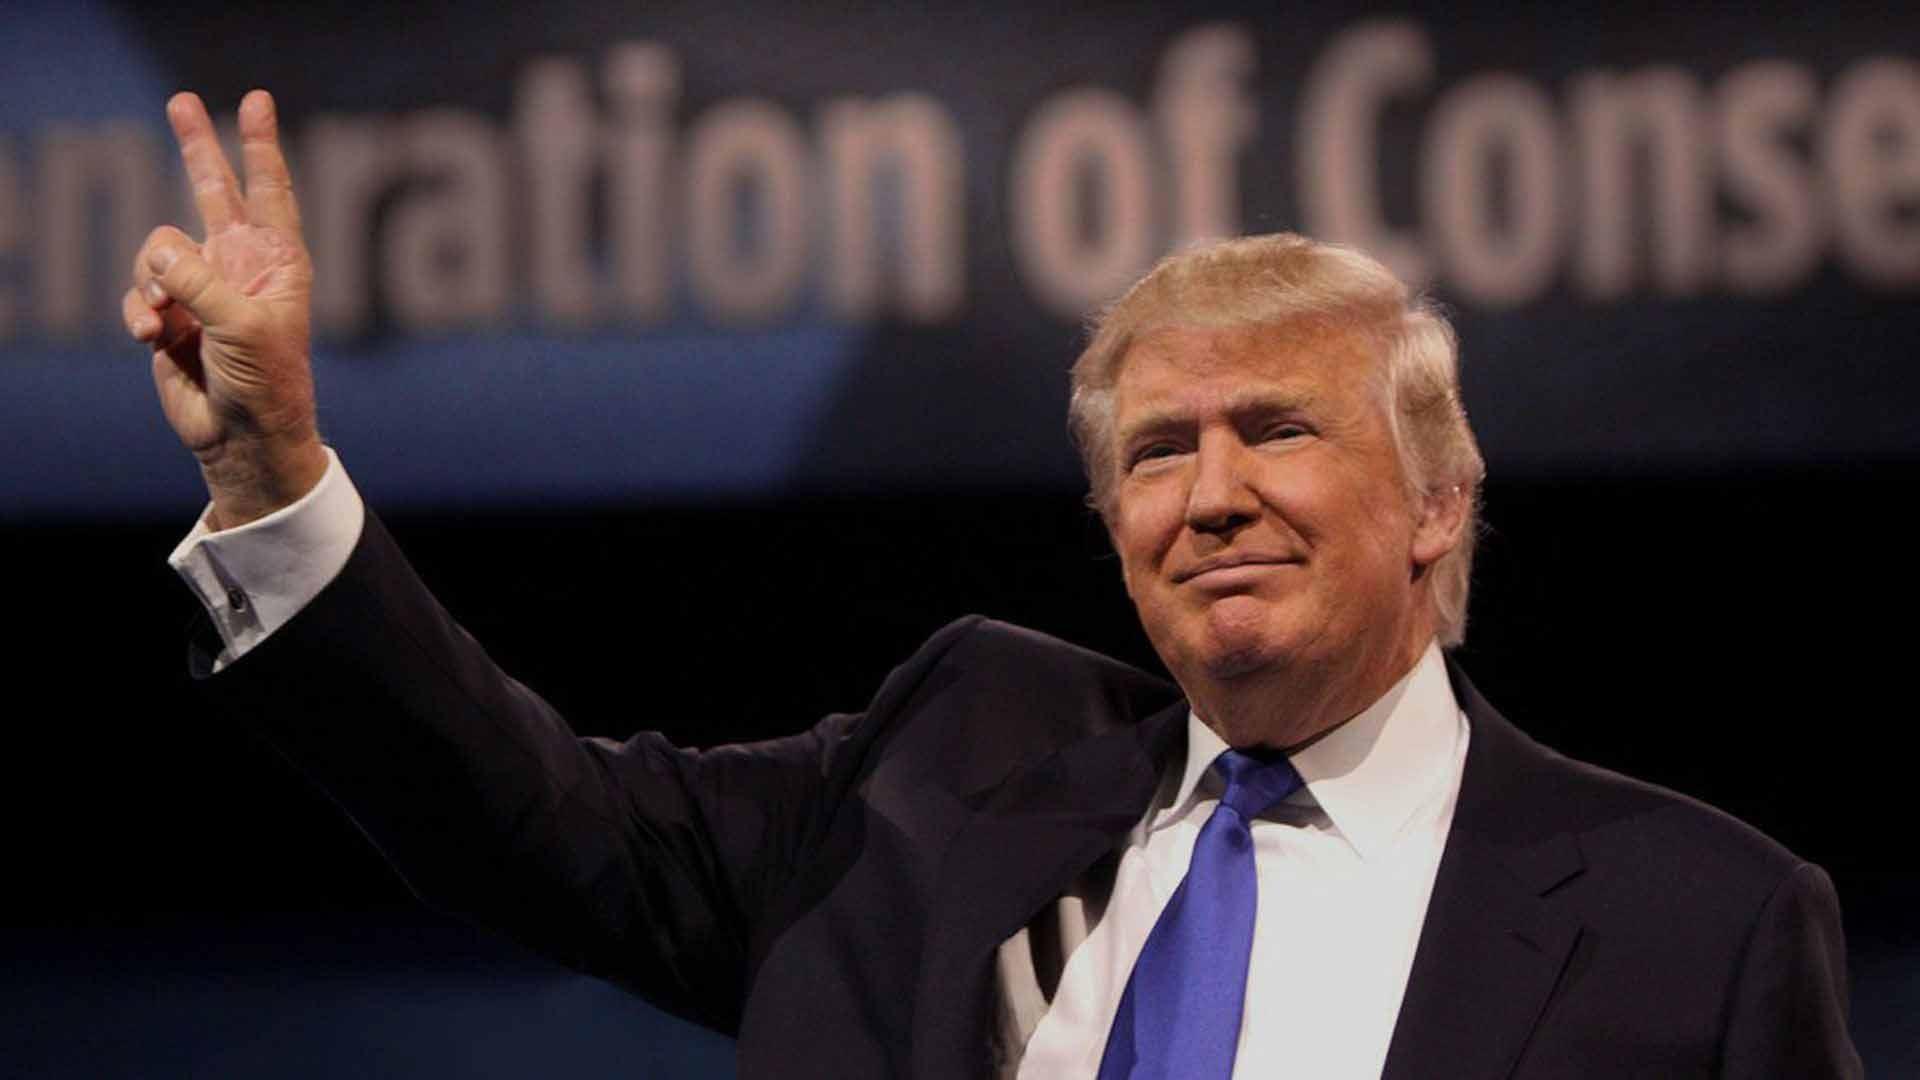 Белый дом порекомендовал New York Times извиниться перед Трампом